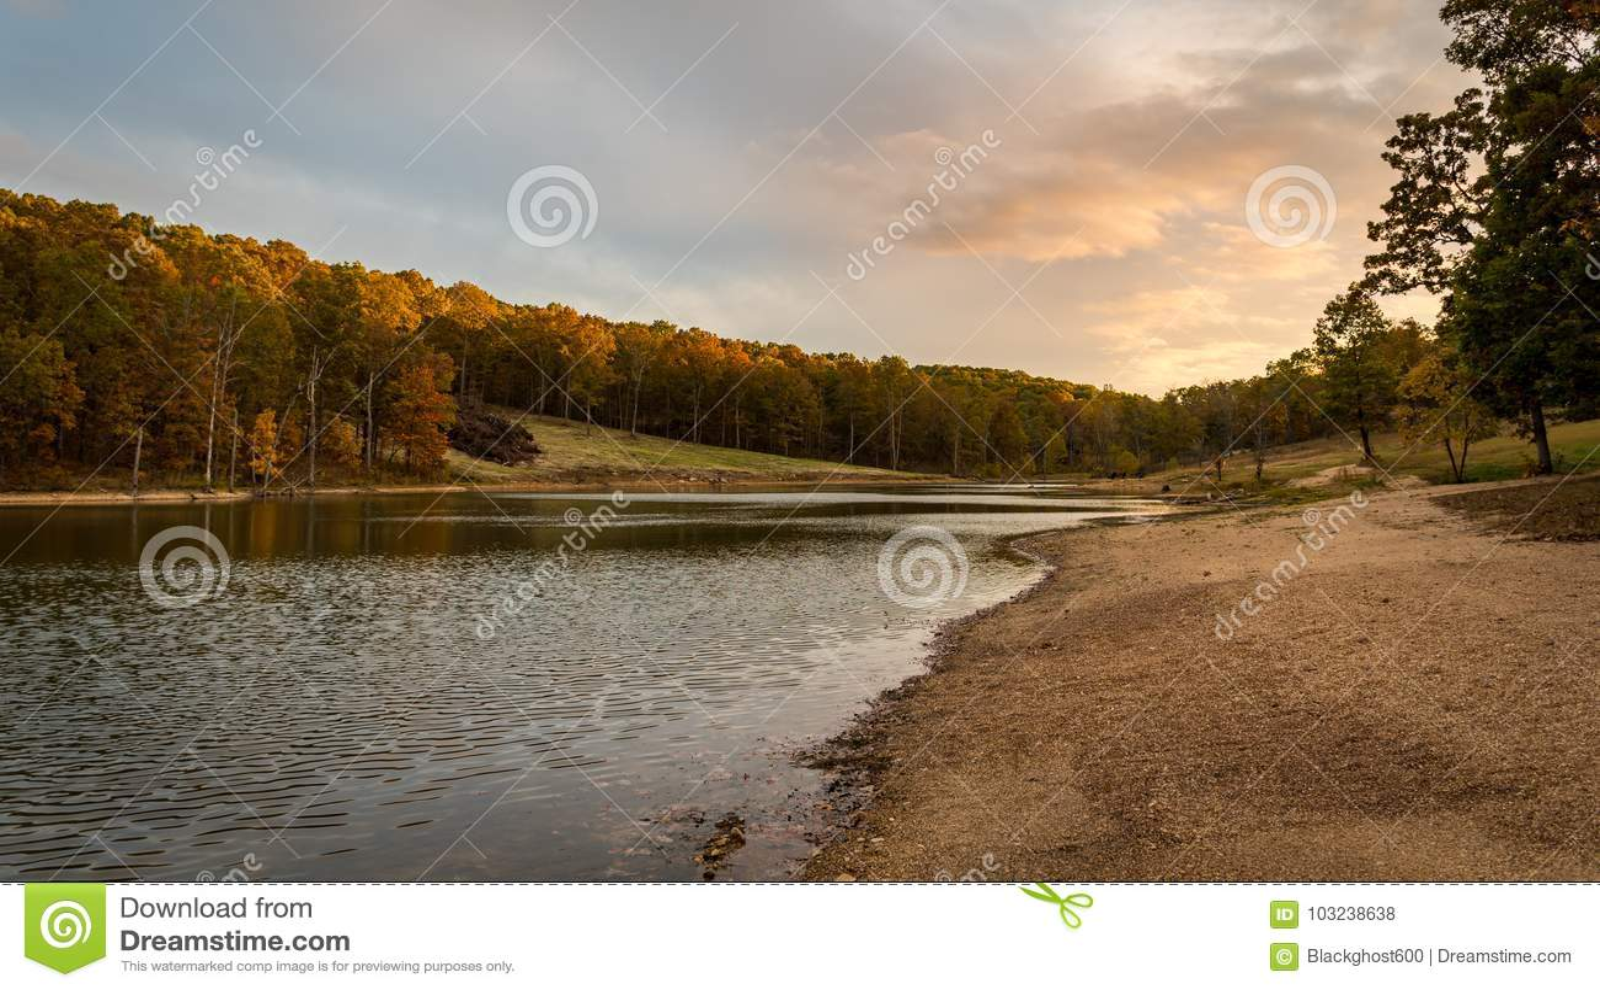 Lake Ozark Missouri >> Sunset By A Stream In The Ozarks Mountains Of Missouri